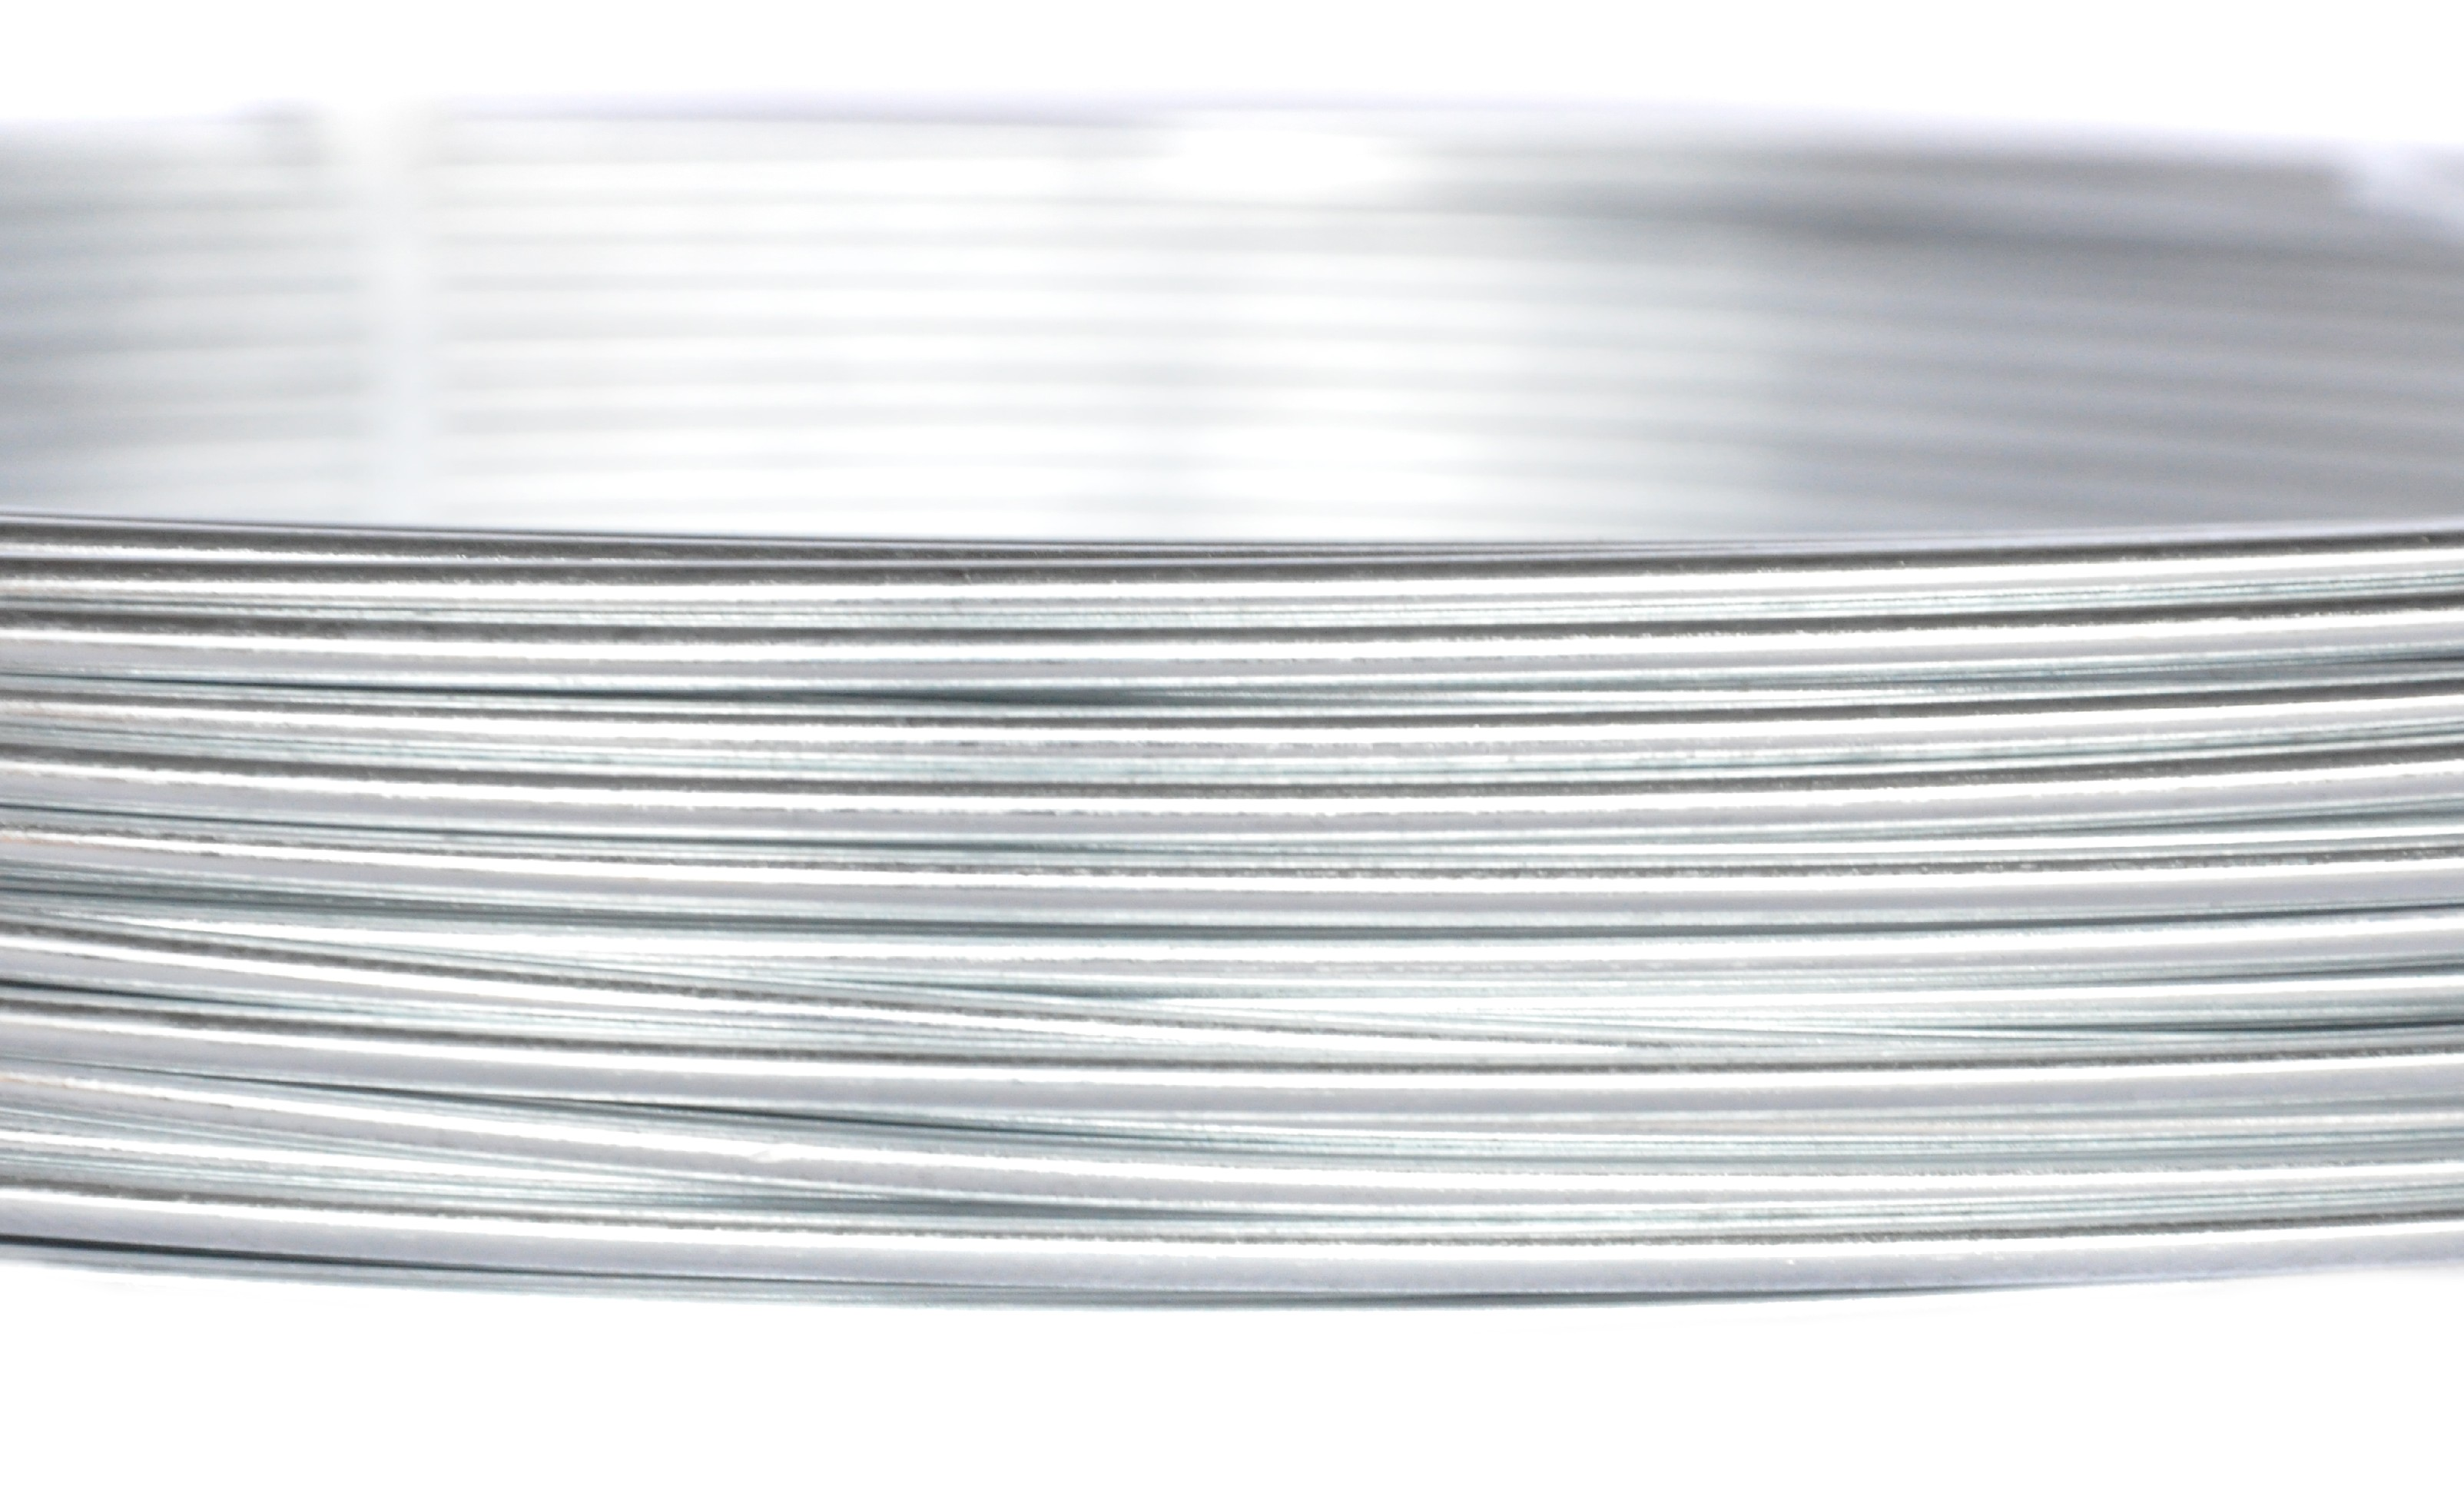 Vinohradnický drát Zn+Al - průměr 1,8 mm, 25 kg